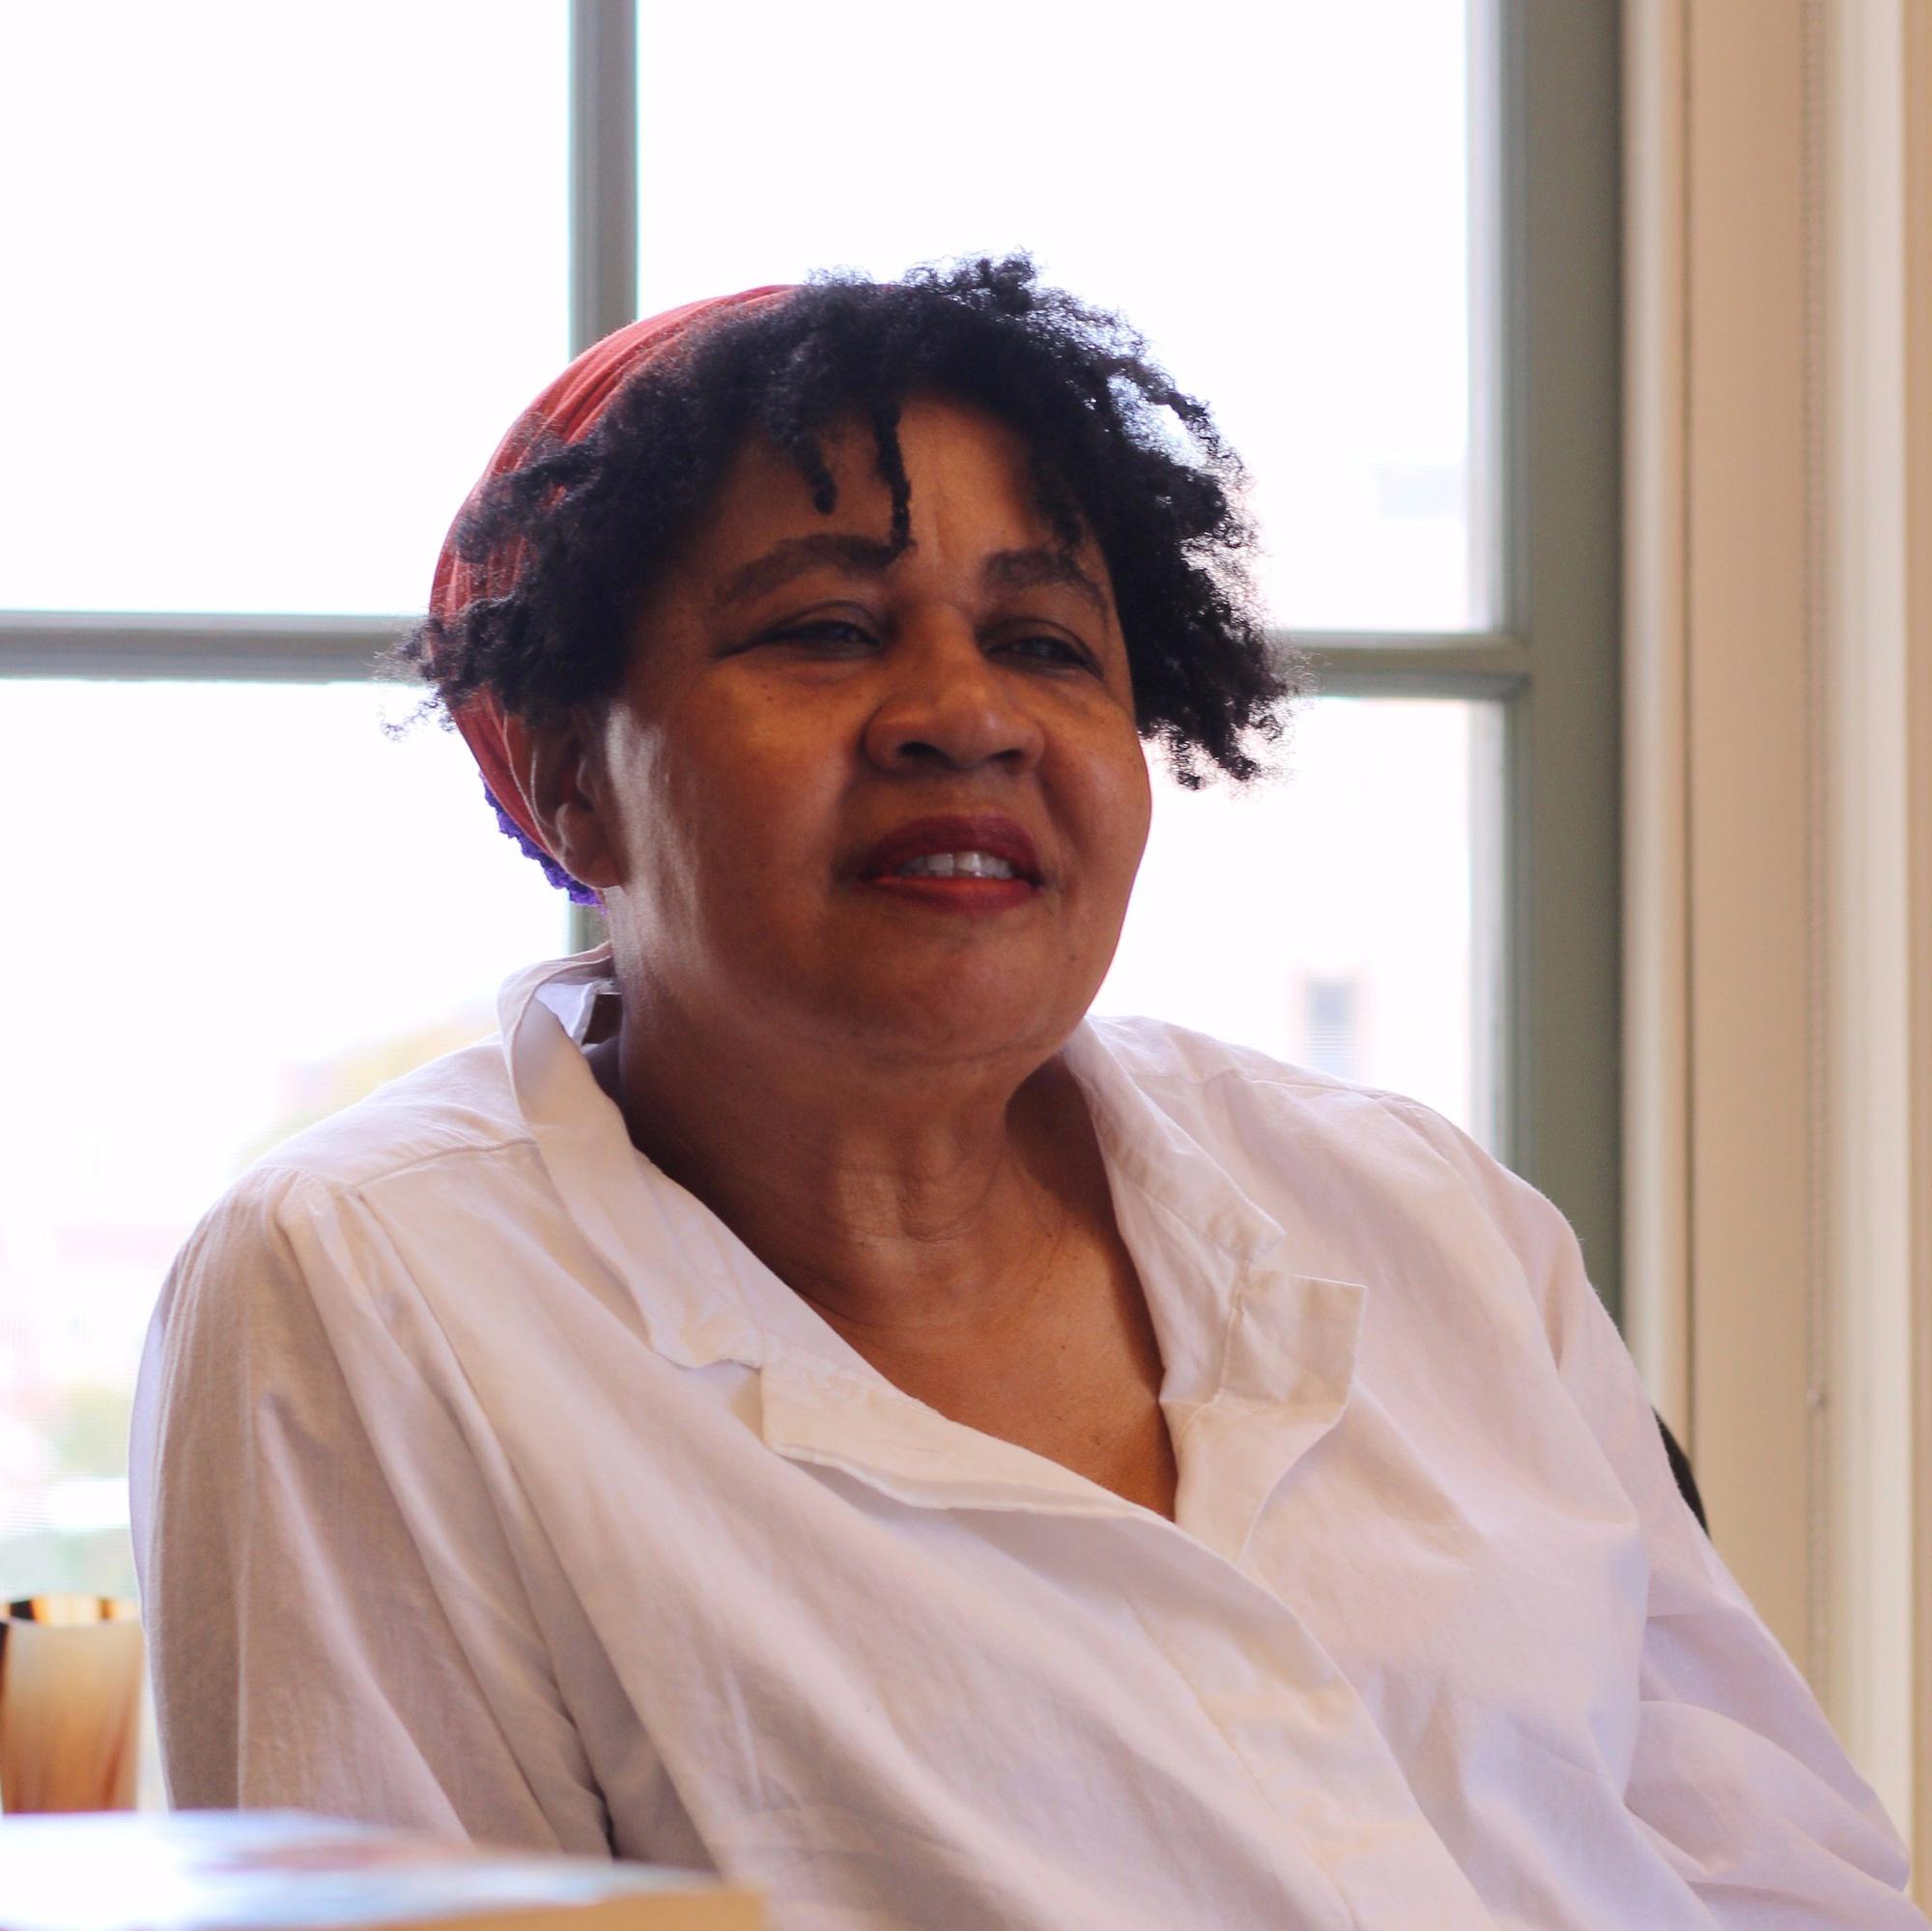 Professor Jamaica Kincaid